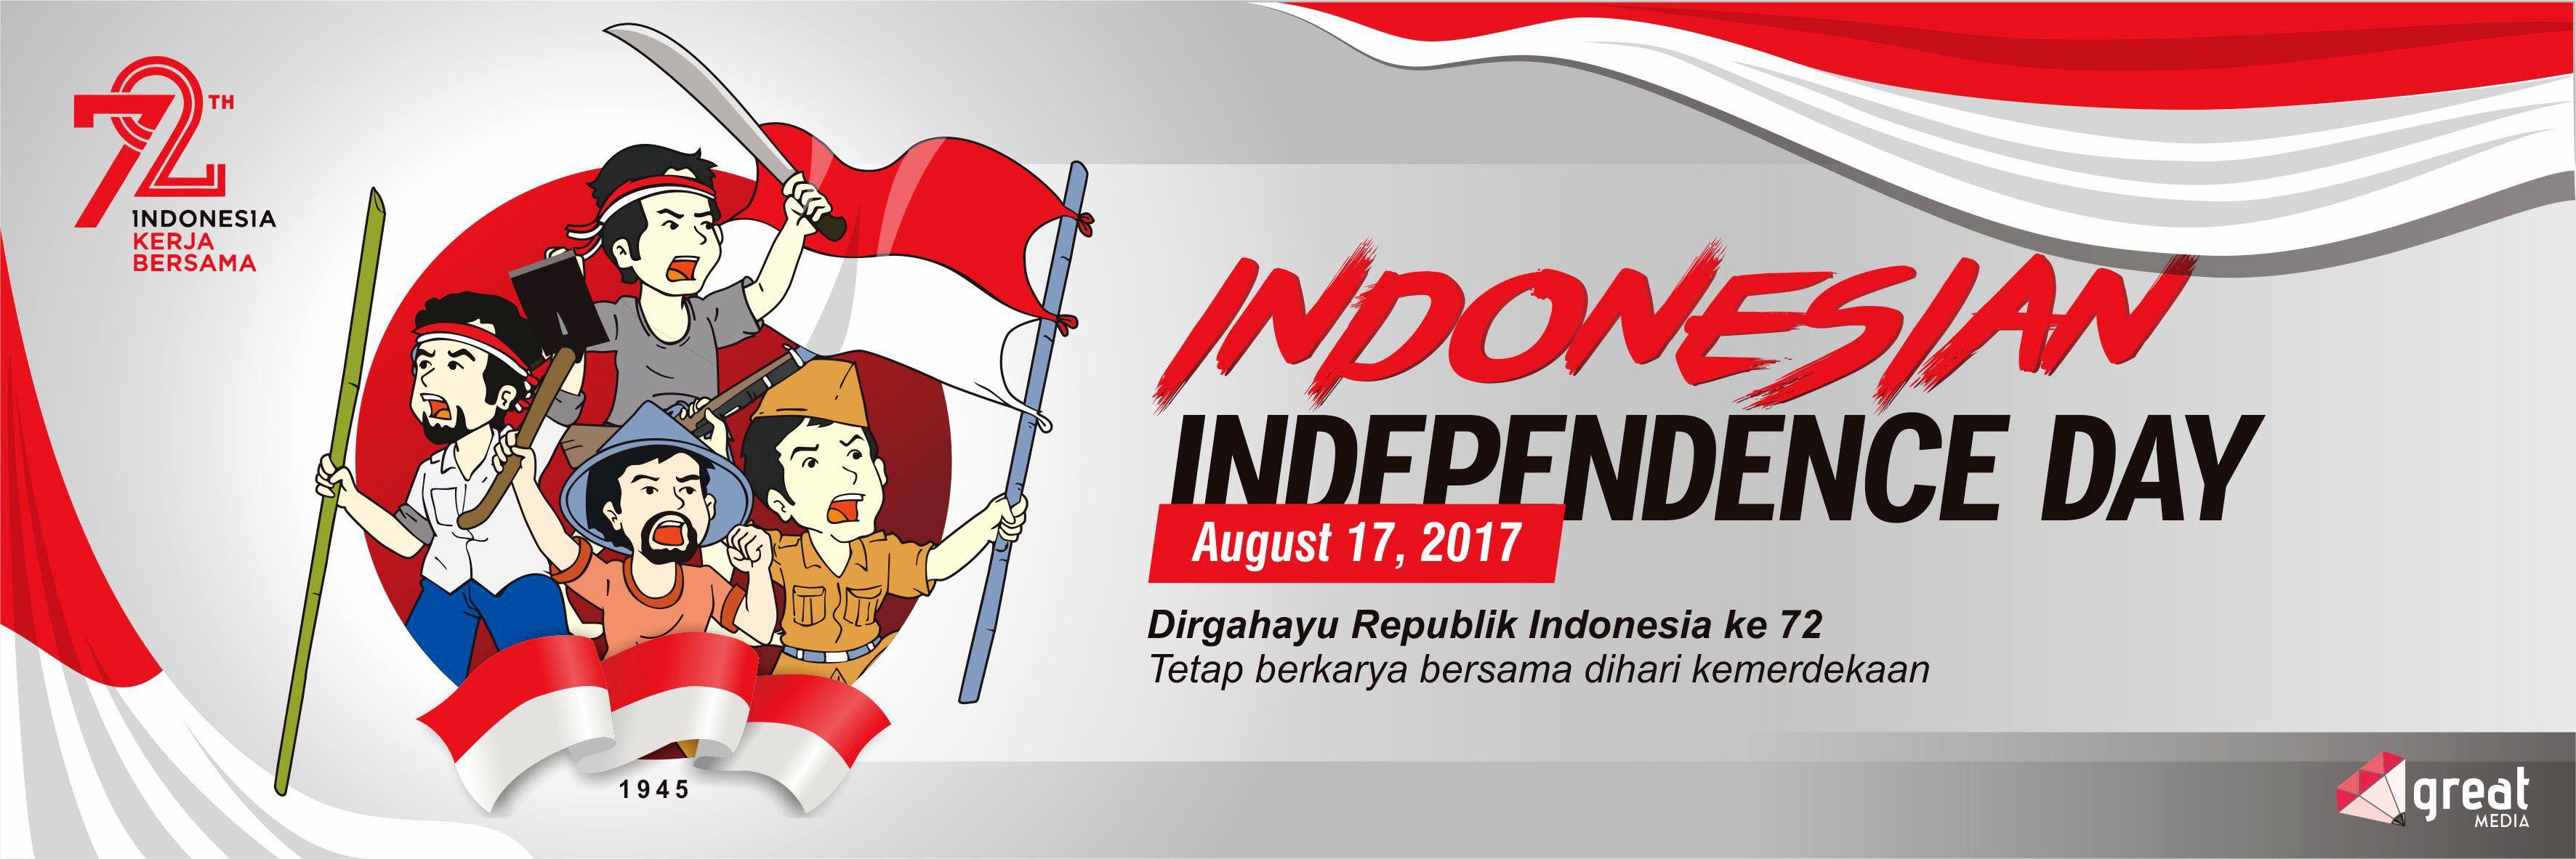 Spanduk Kemerdekaan Indonesia ke 72 Open Order Azmil's